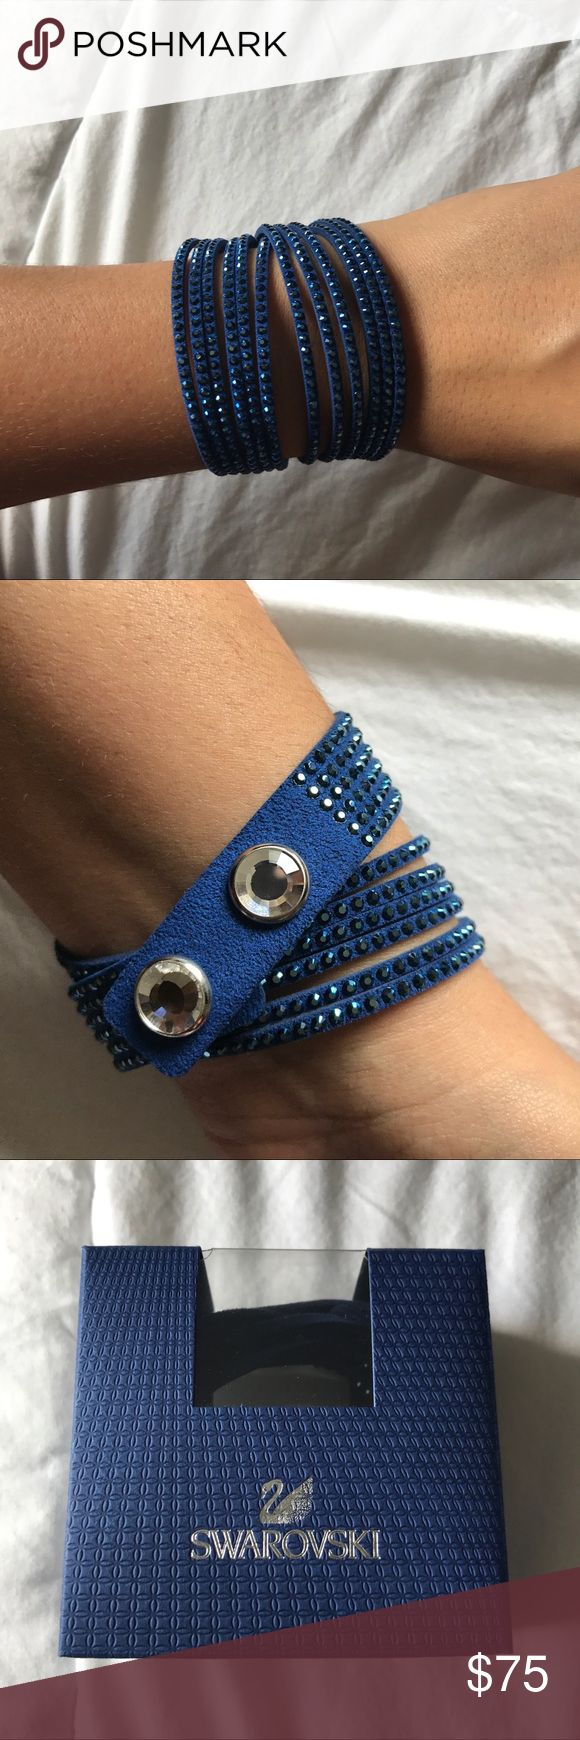 Swarovski slake bracelet Adorable blue Swarovski slake bracelet. Never worn comes with original box, bag, and receipt. Purchased in Italy and was given as a gift. 100% authentic. Swarovski Jewelry Bracelets